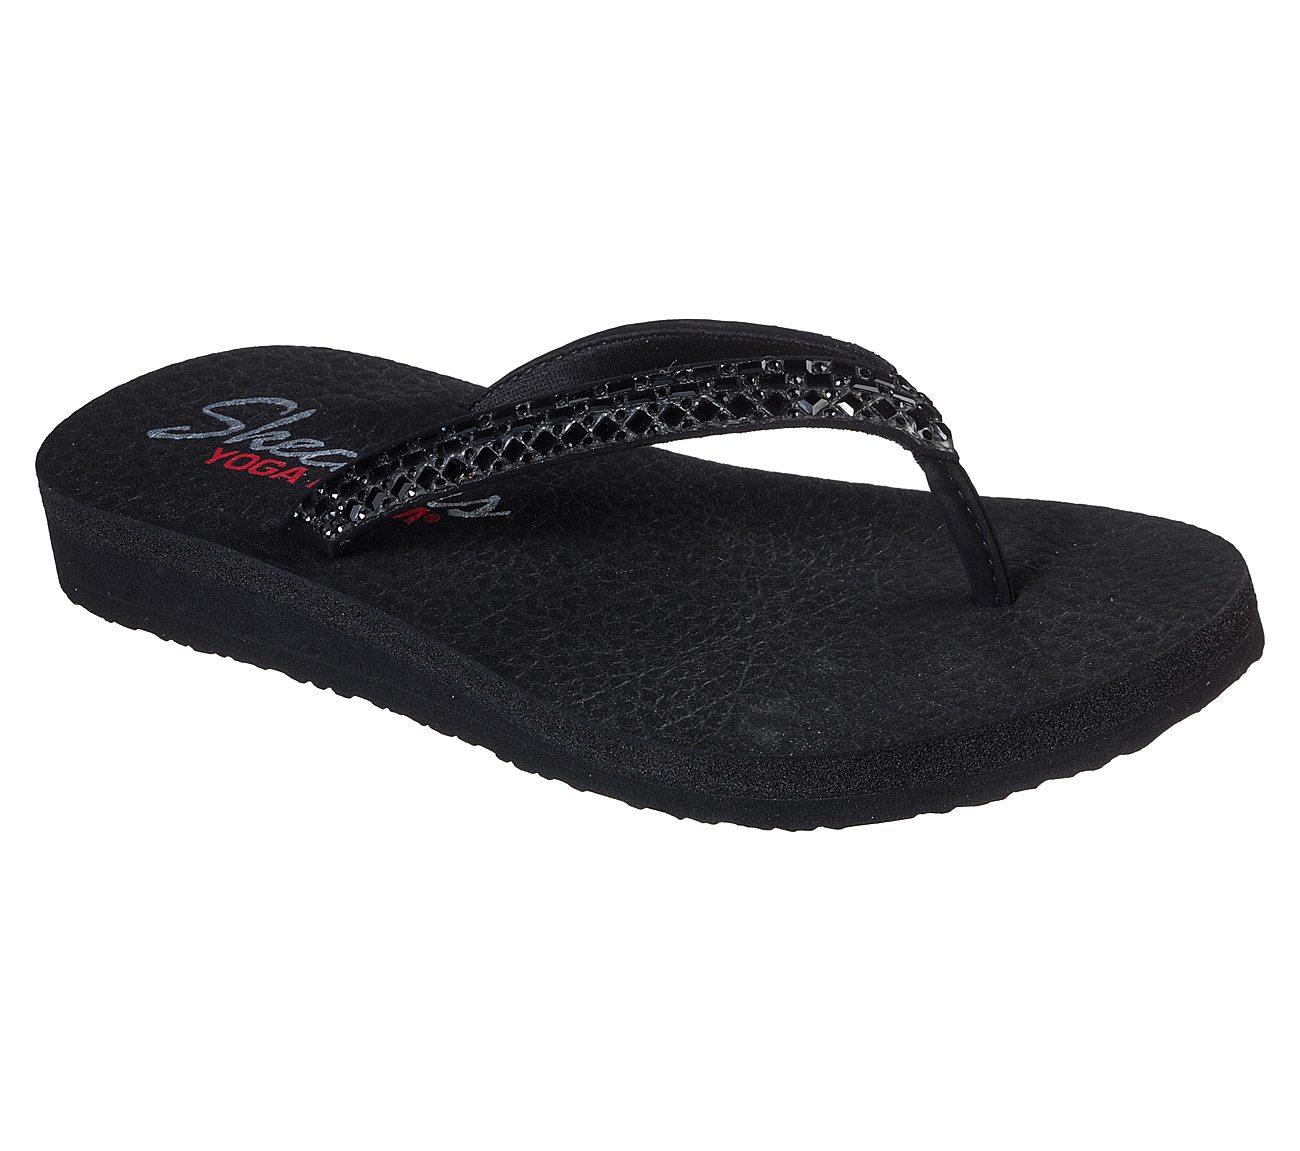 Buy SKECHERS Meditation Shine Away Cali Shoes JkdD6